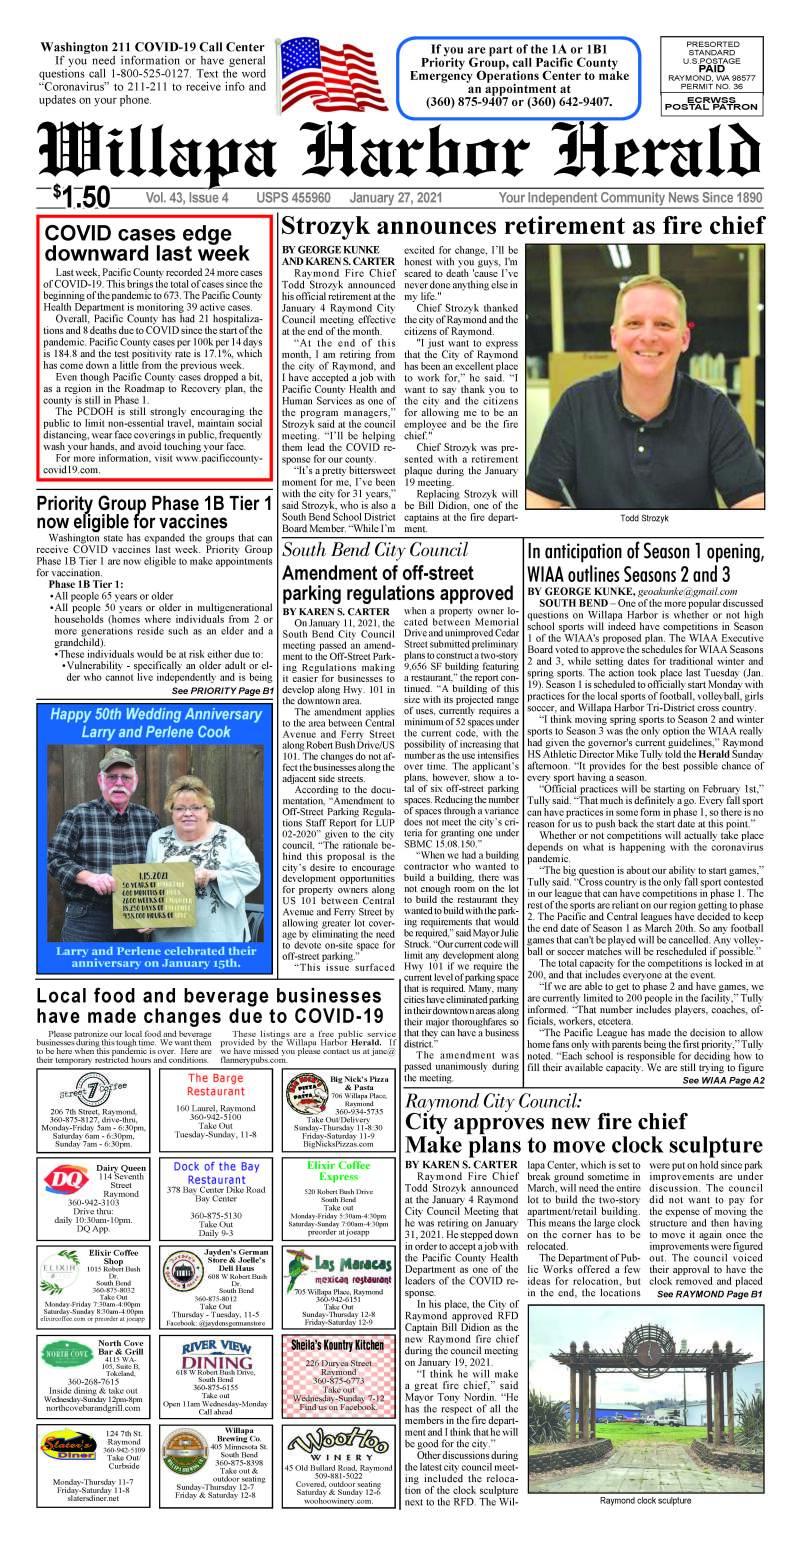 January 27, 2021 Willapa Harbor Herald and Pacific County Press